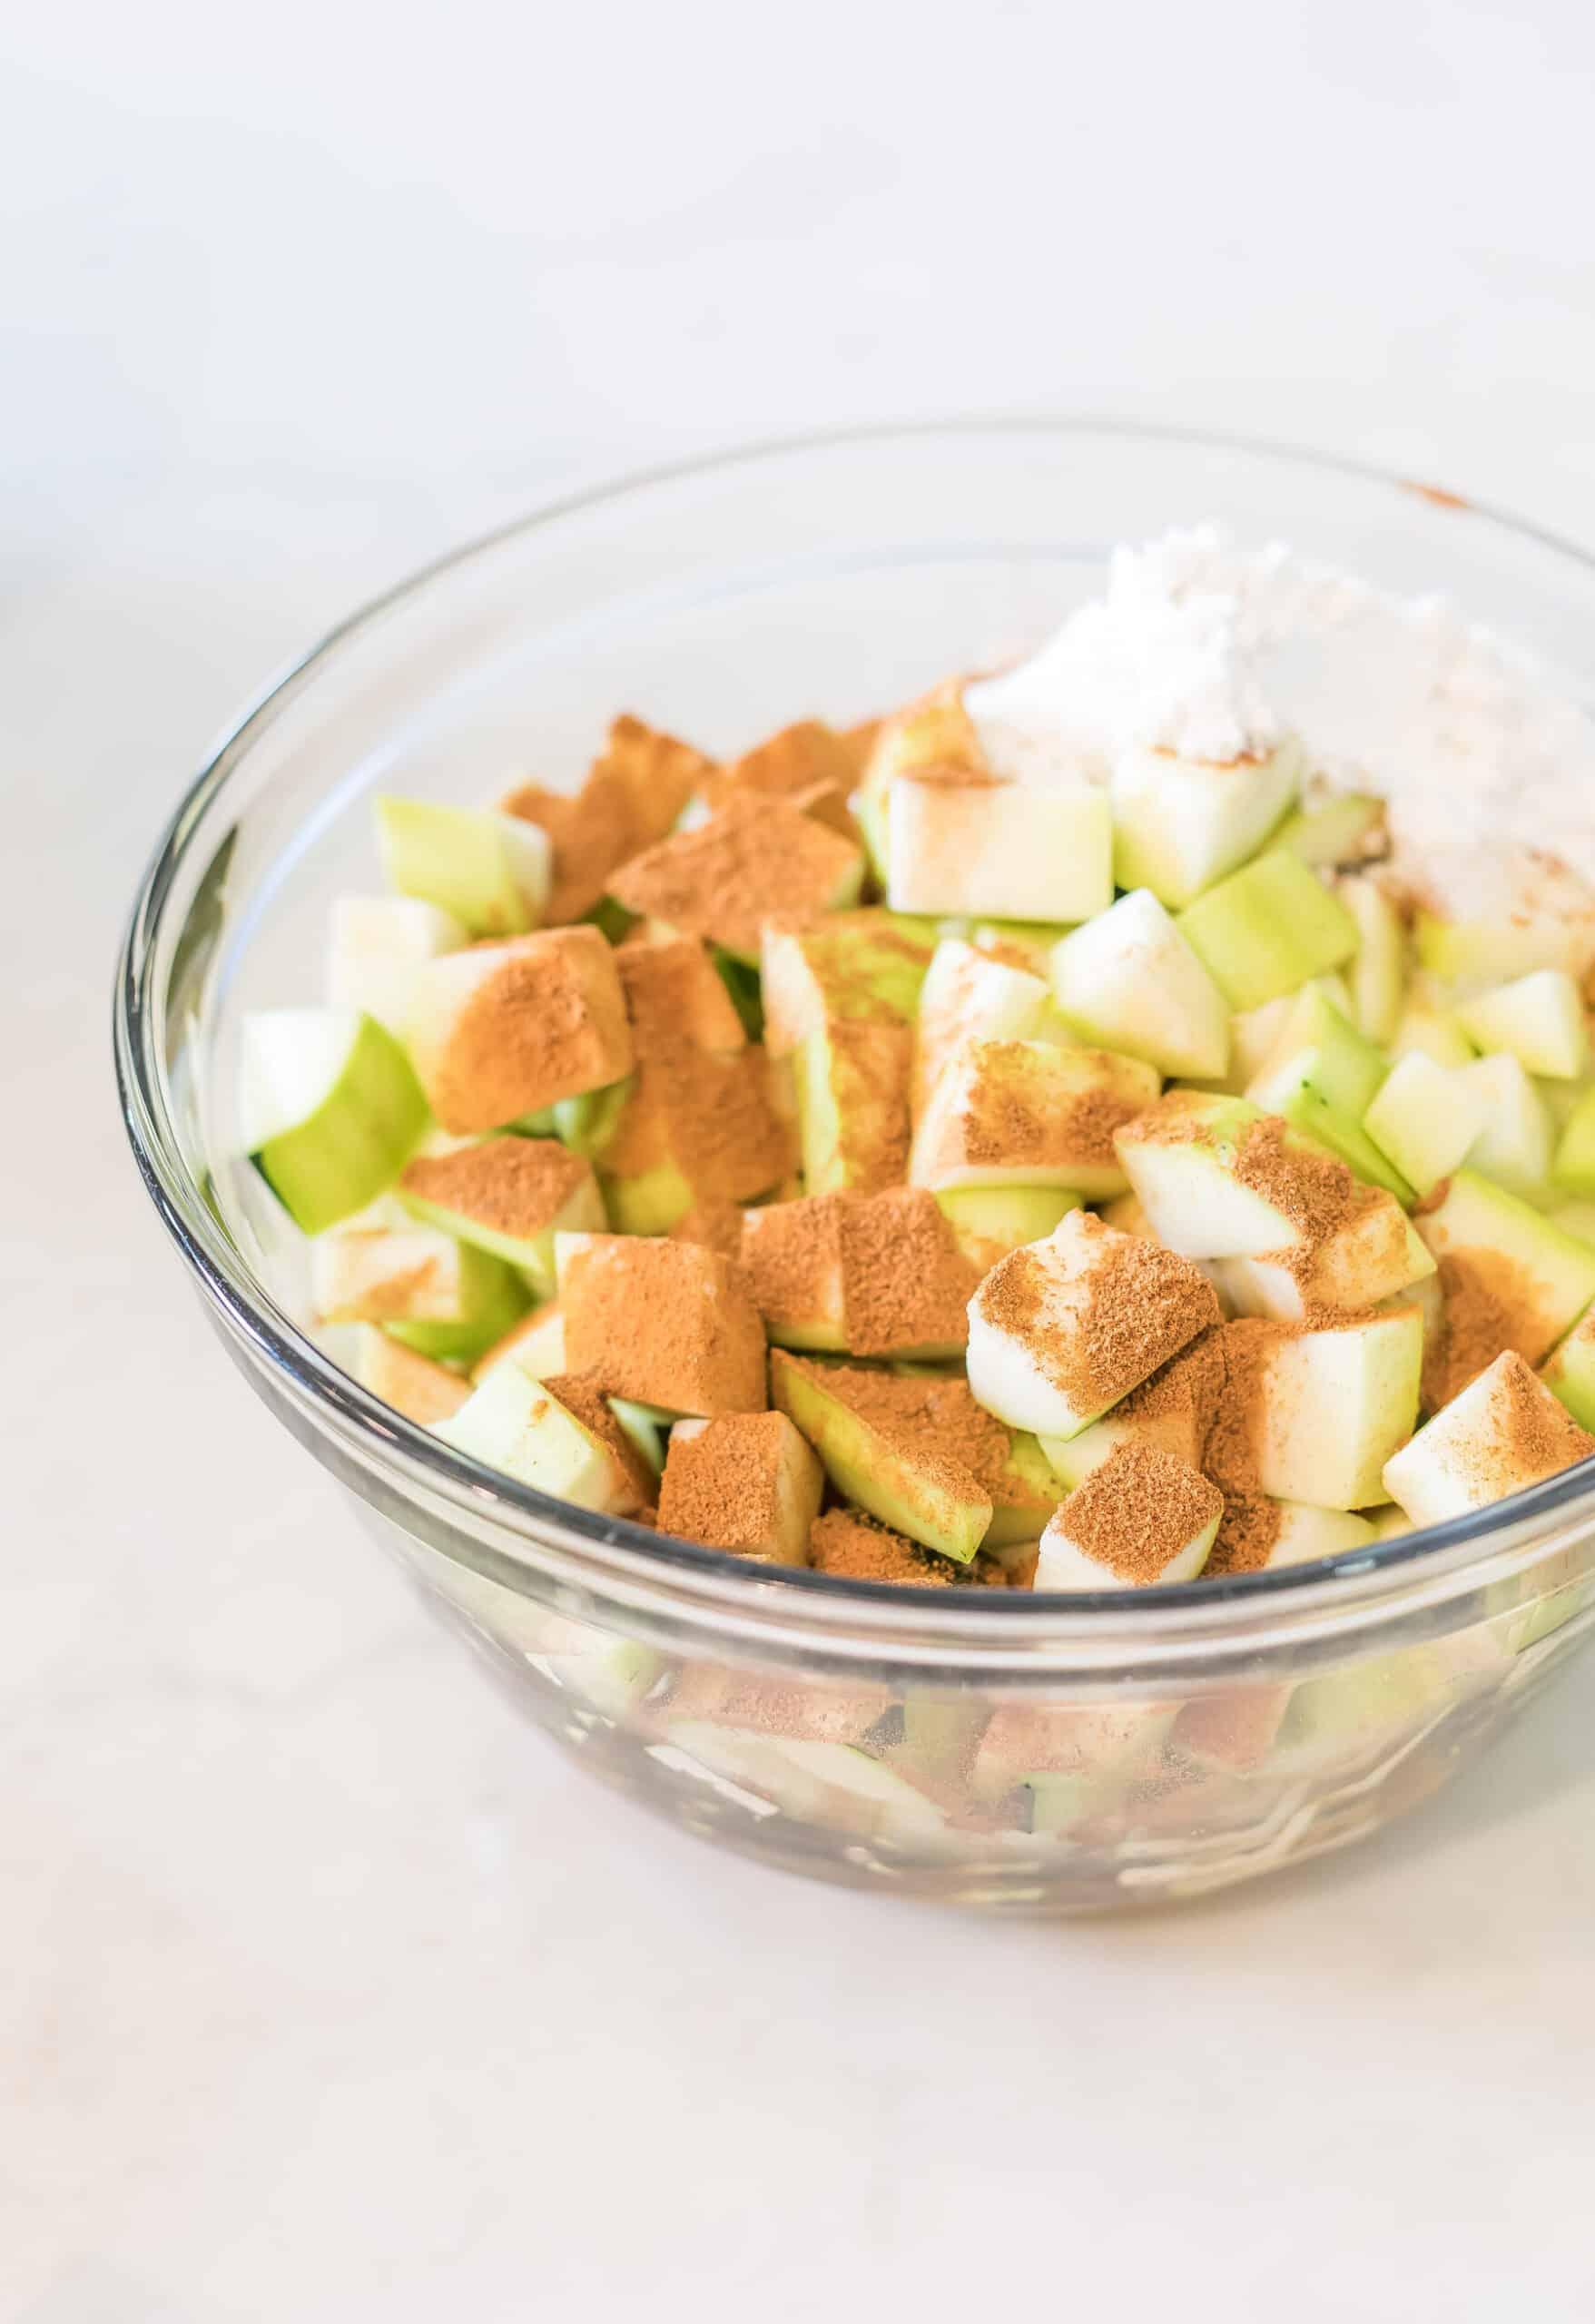 zuchinni in a bowl with apple pie spice